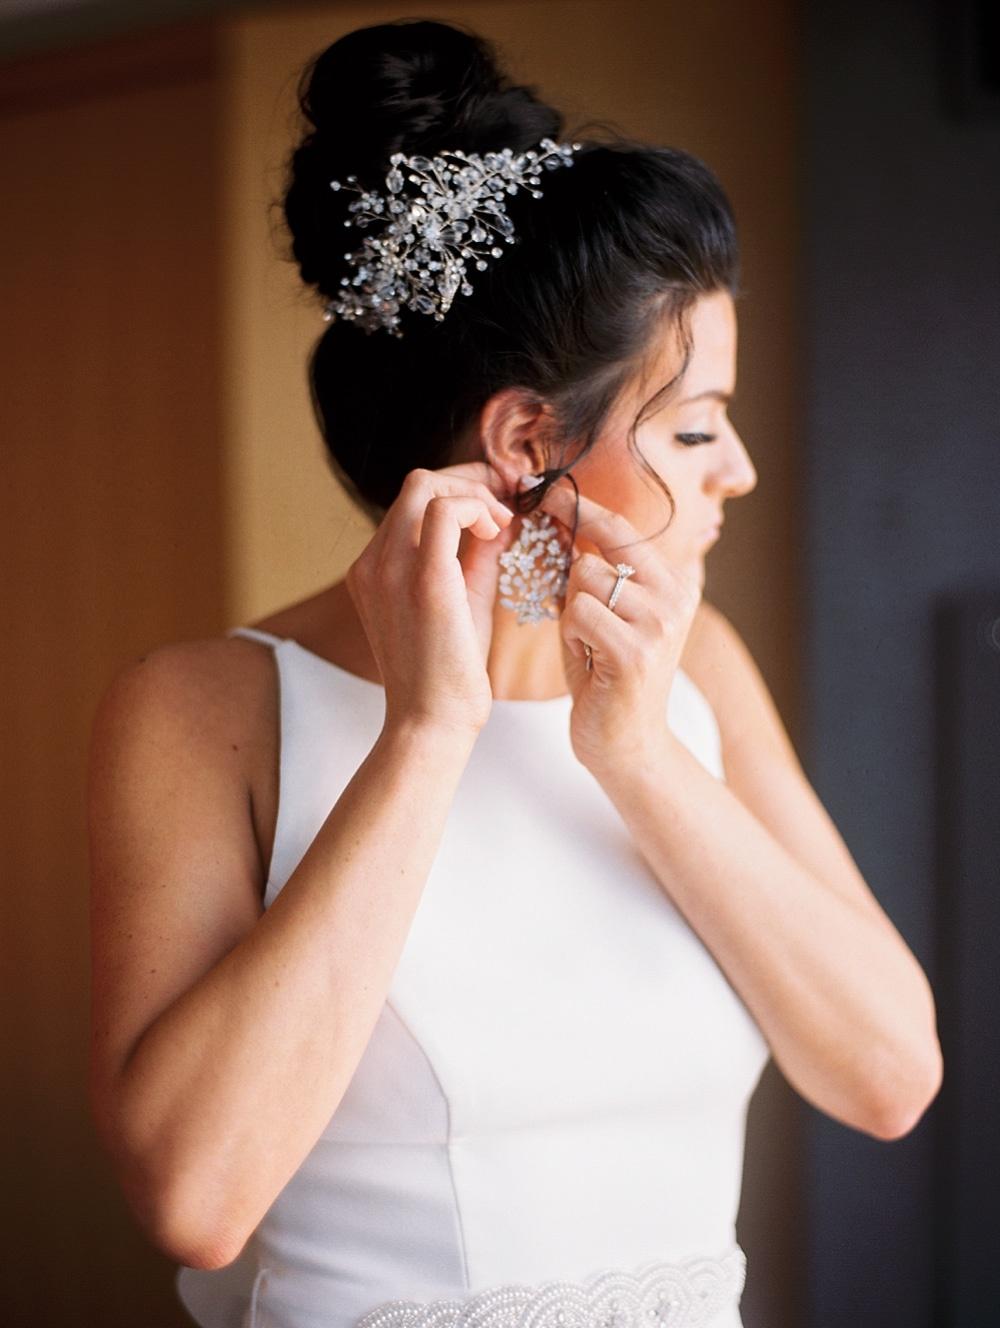 Kristin-La-Voie-Photography-chicago-wedding-photographer-127